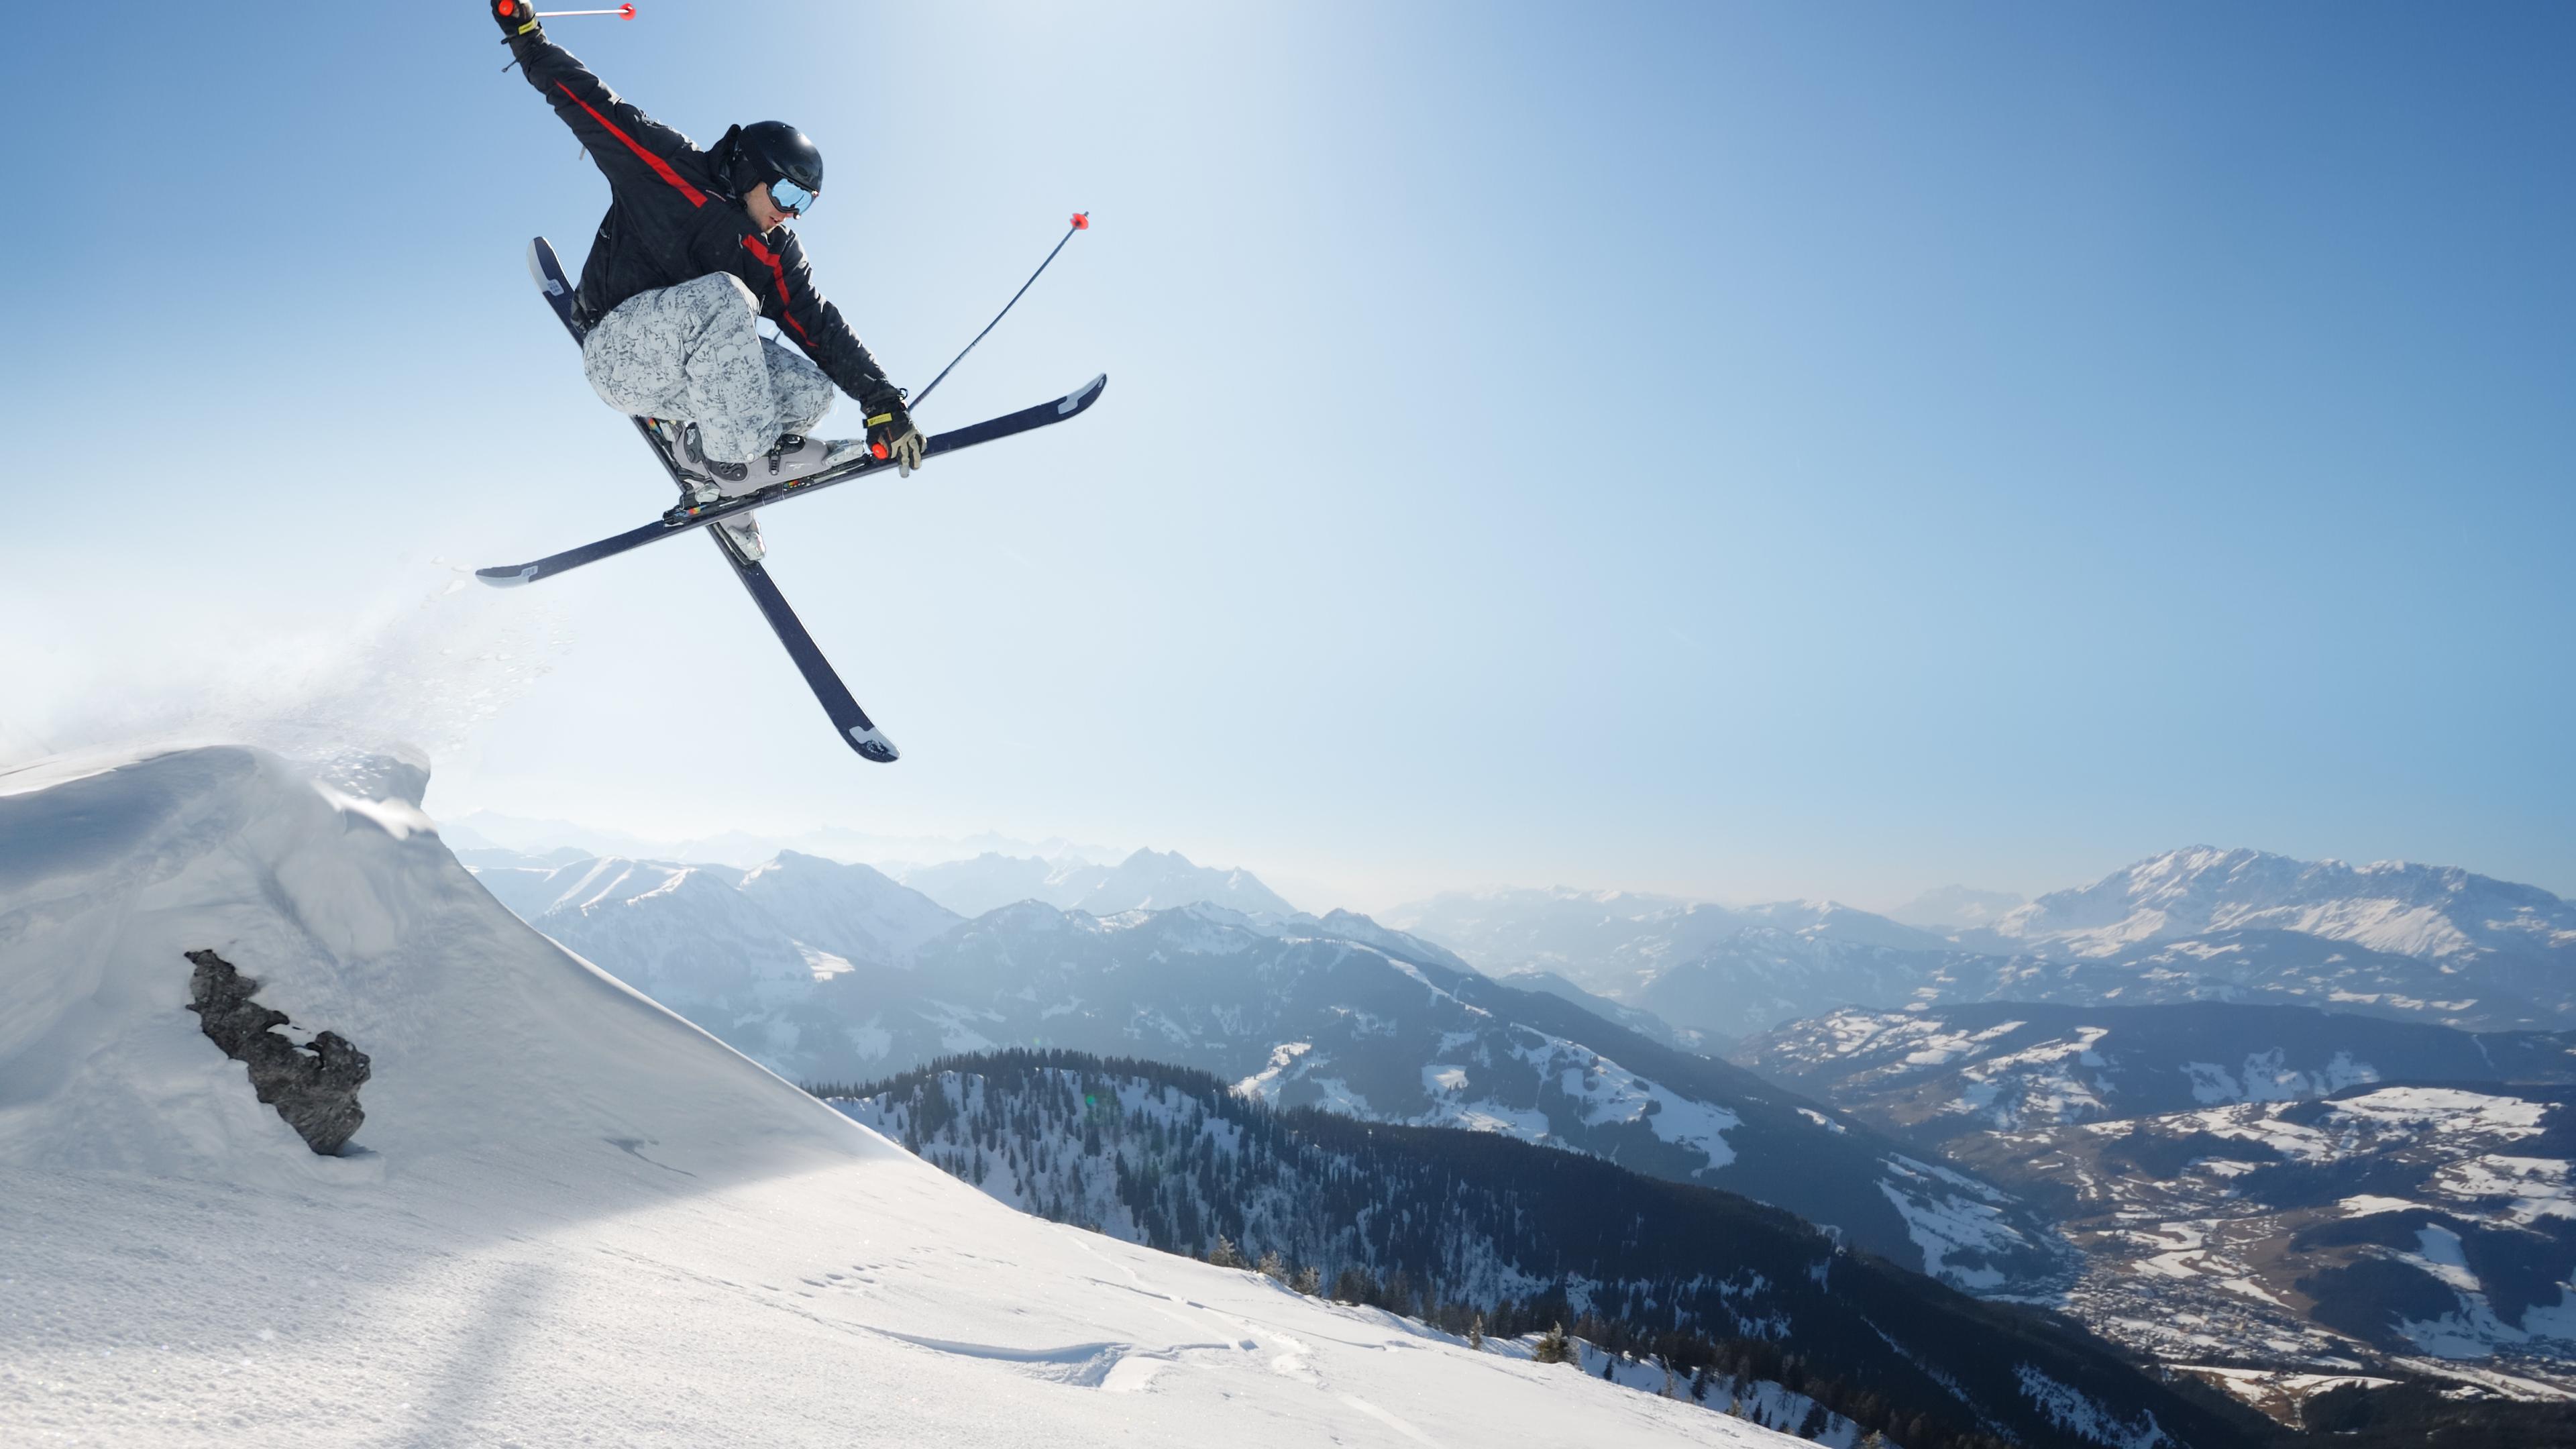 skiing trick widescreen wallpaper 53327